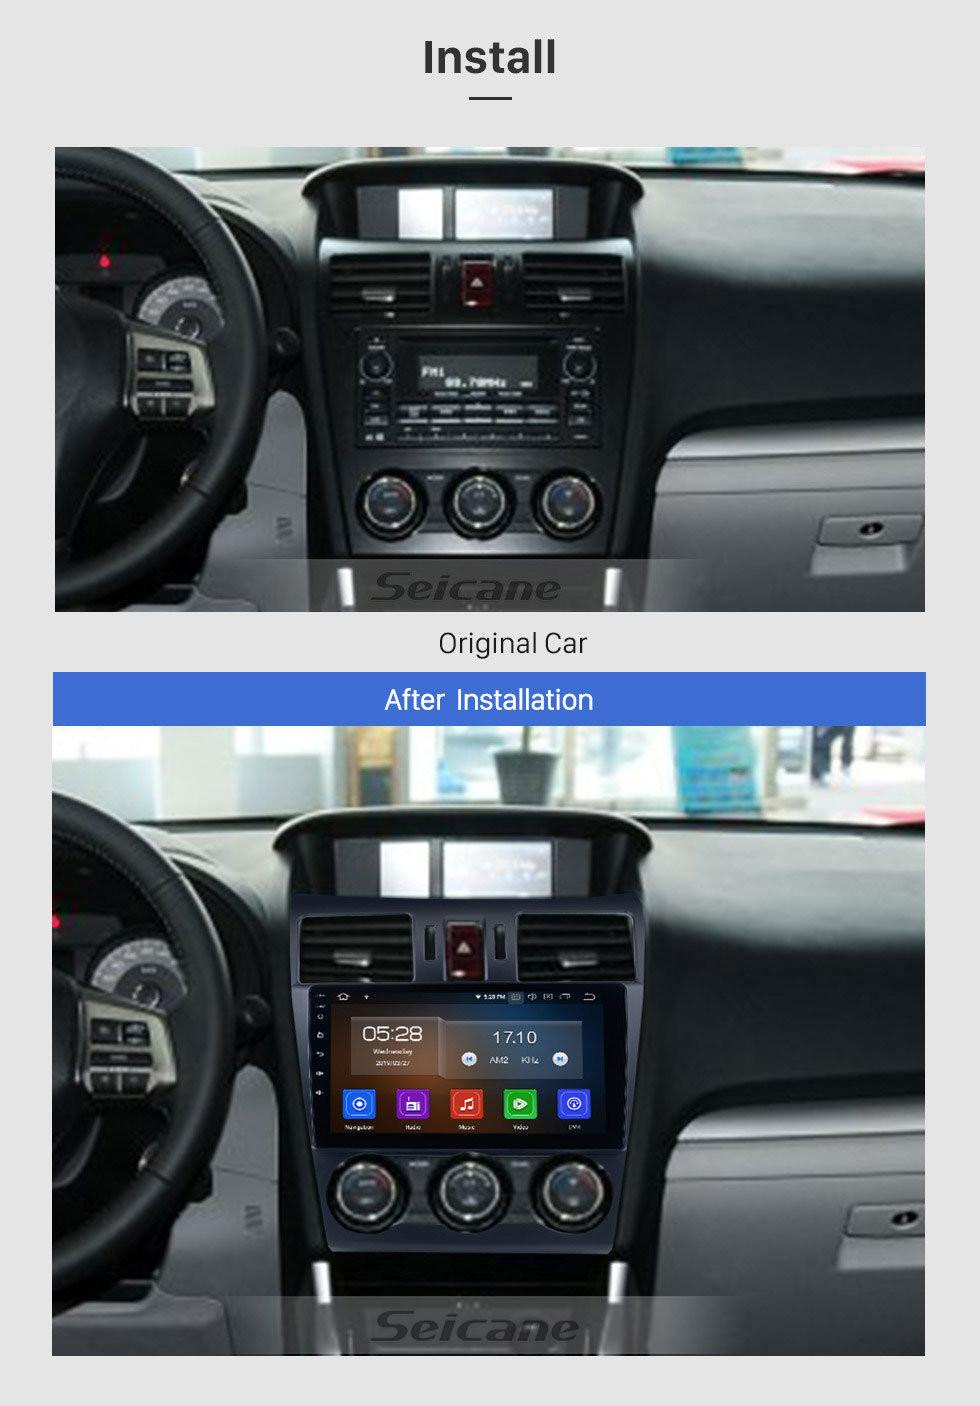 Seicane HD Touchscreen 2014 2015 2016 Subaru Forester Android 10.0 9 inch GPS Navigation Radio Bluetooth USB Carplay WIFI Music AUX support TPMS SWC OBD2 Digital TV